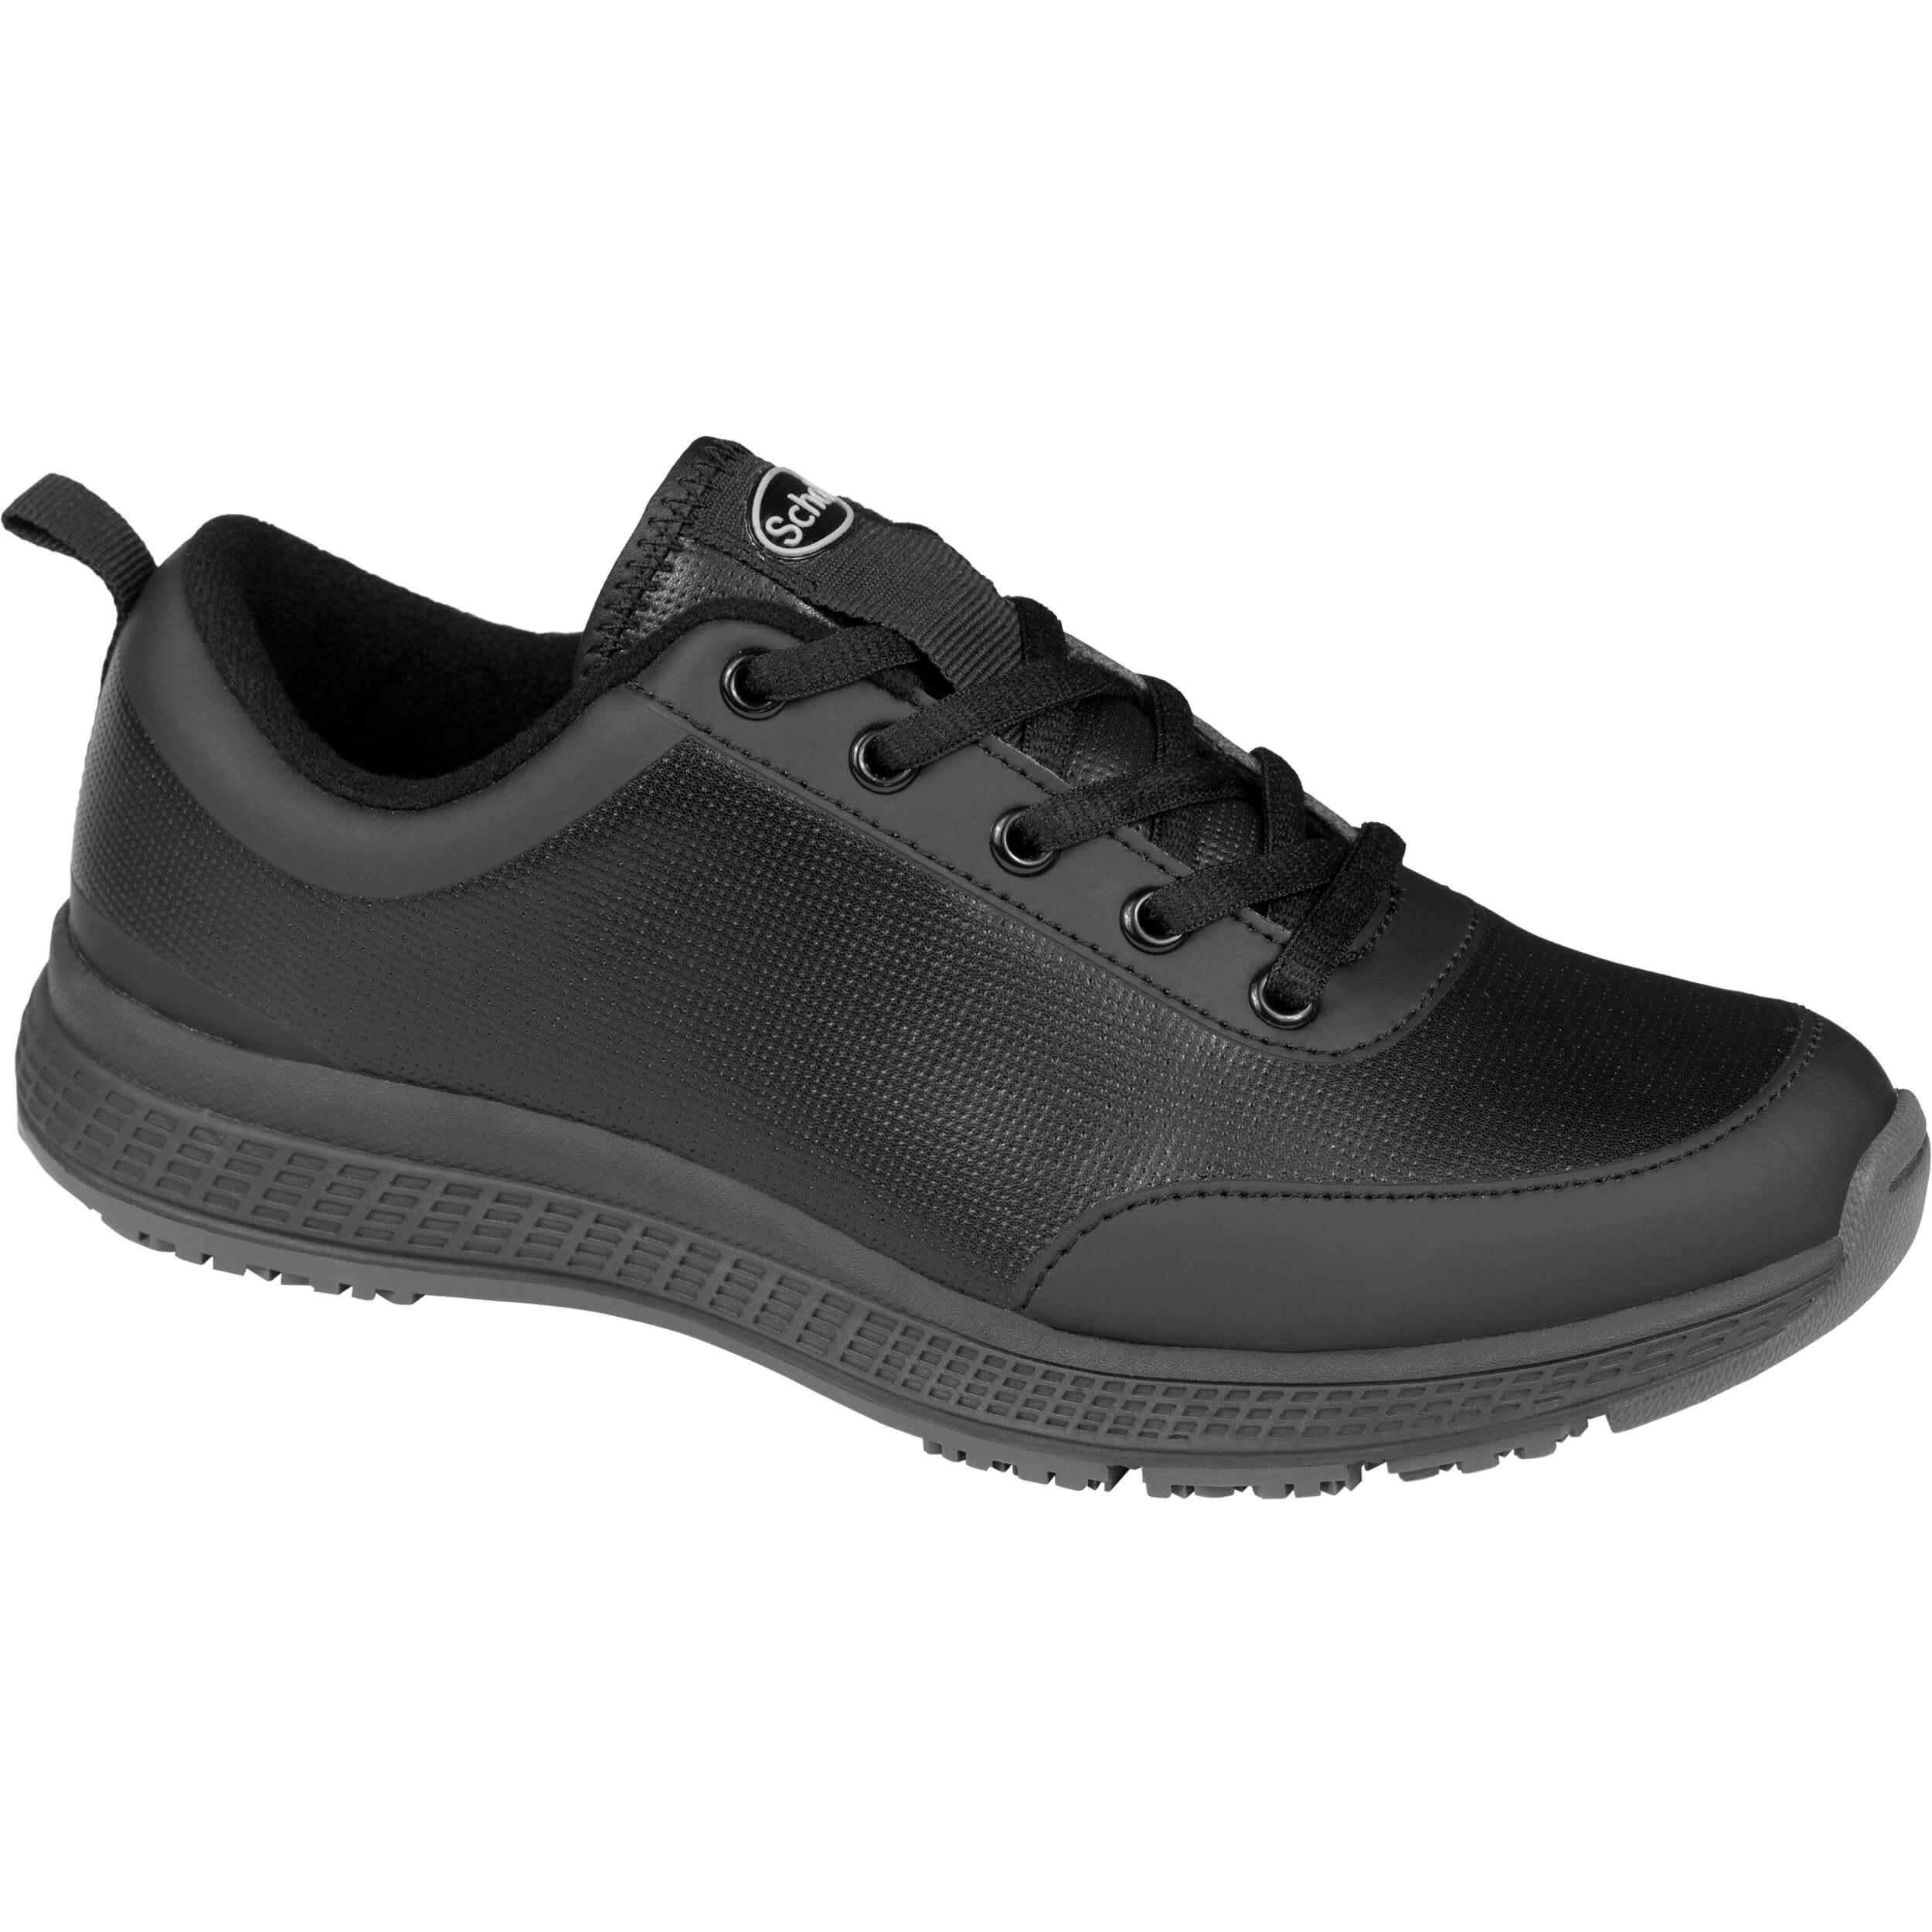 Dr Scholl Shoes Energy Plus Μαύρο ΝΕΟ Ανδρικά Ανατομικά Παπούτσια, Χαρίζουν Σωστ φαρμακείο   ανατομικά παπούτσια   ανδρικά ανατομικά παπούτσια